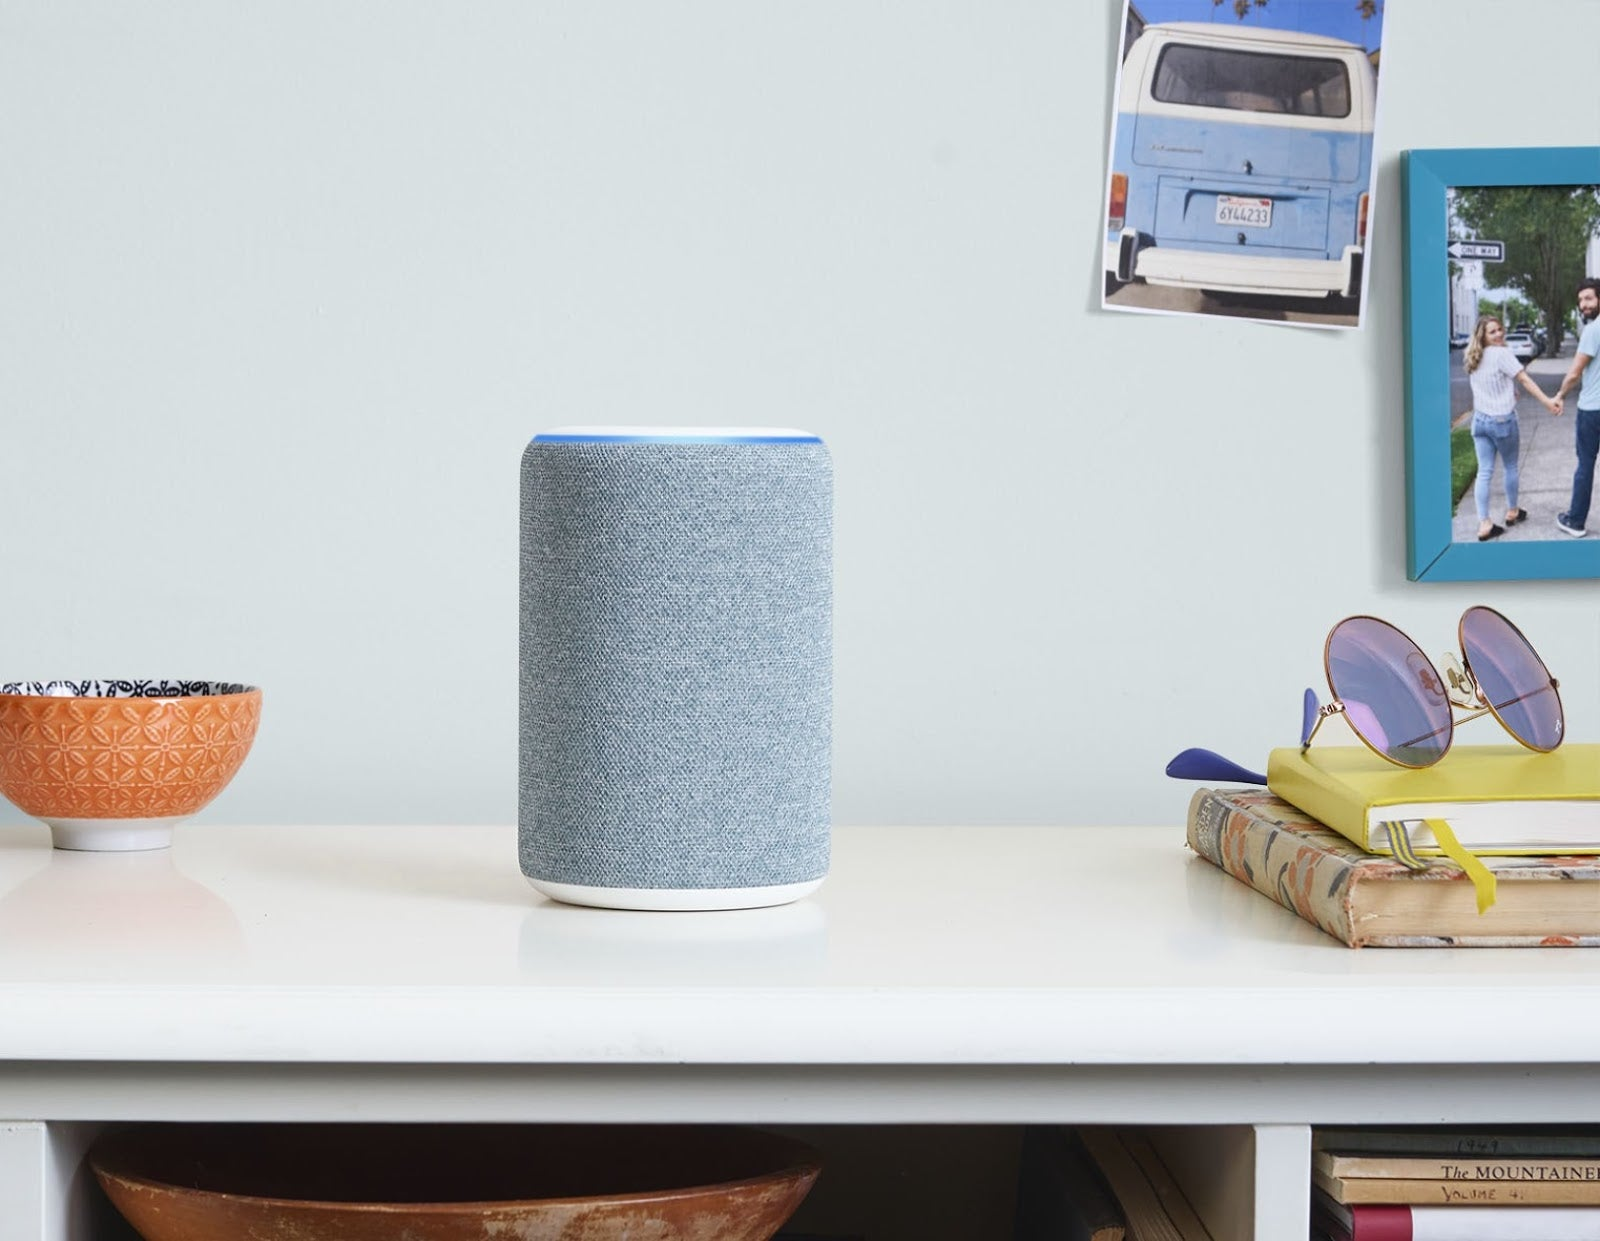 Amazon Blitzkrieg! All The New Gadgets Coming To Australia